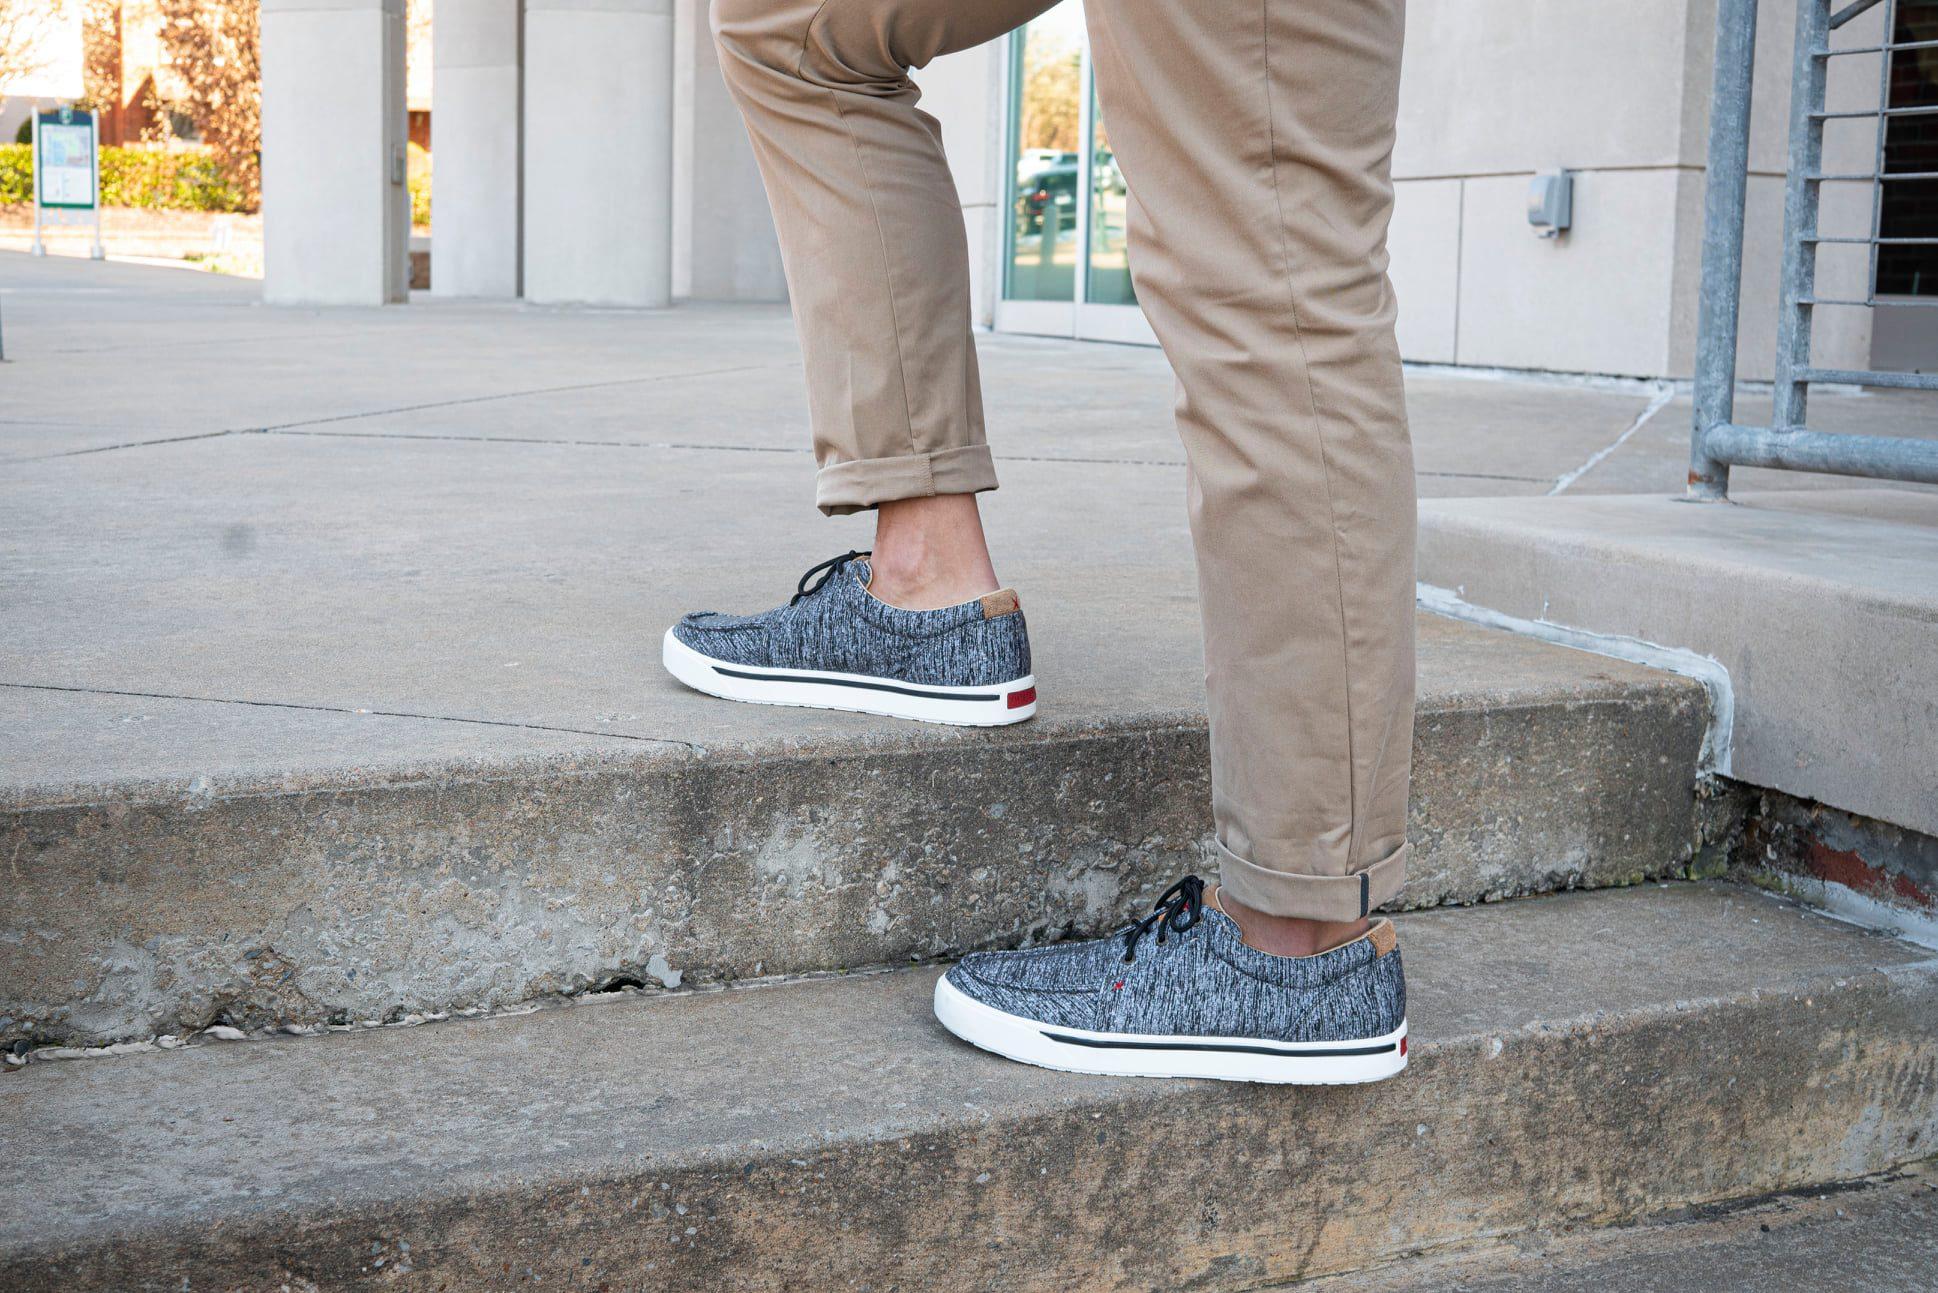 Man wearing modern gray patterned Twisted X sneakers